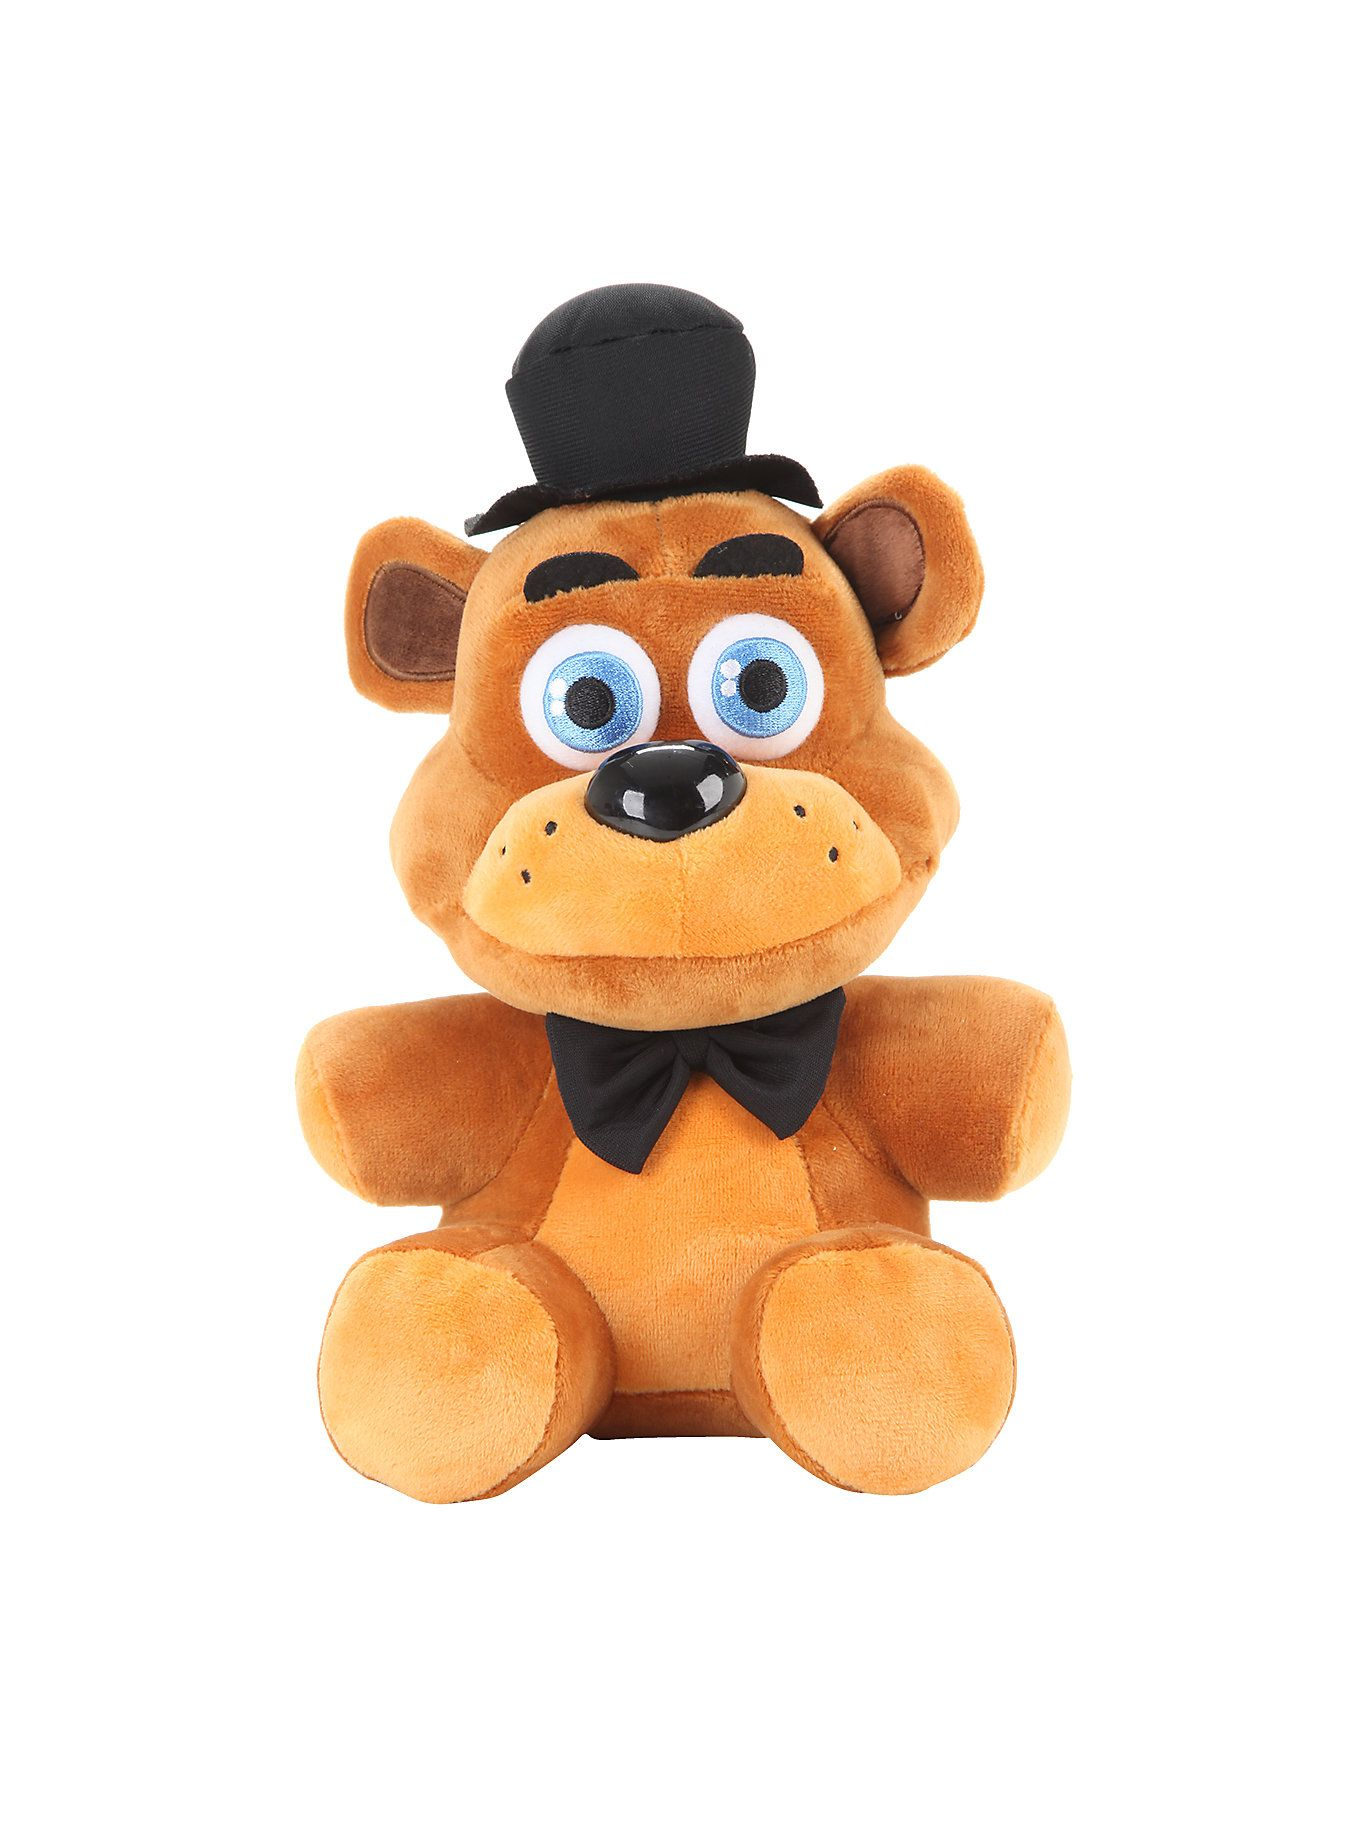 cheap for discount 7357a 3a5d6 Funko Five Nights At Freddy s Freddy Fazbear Plush